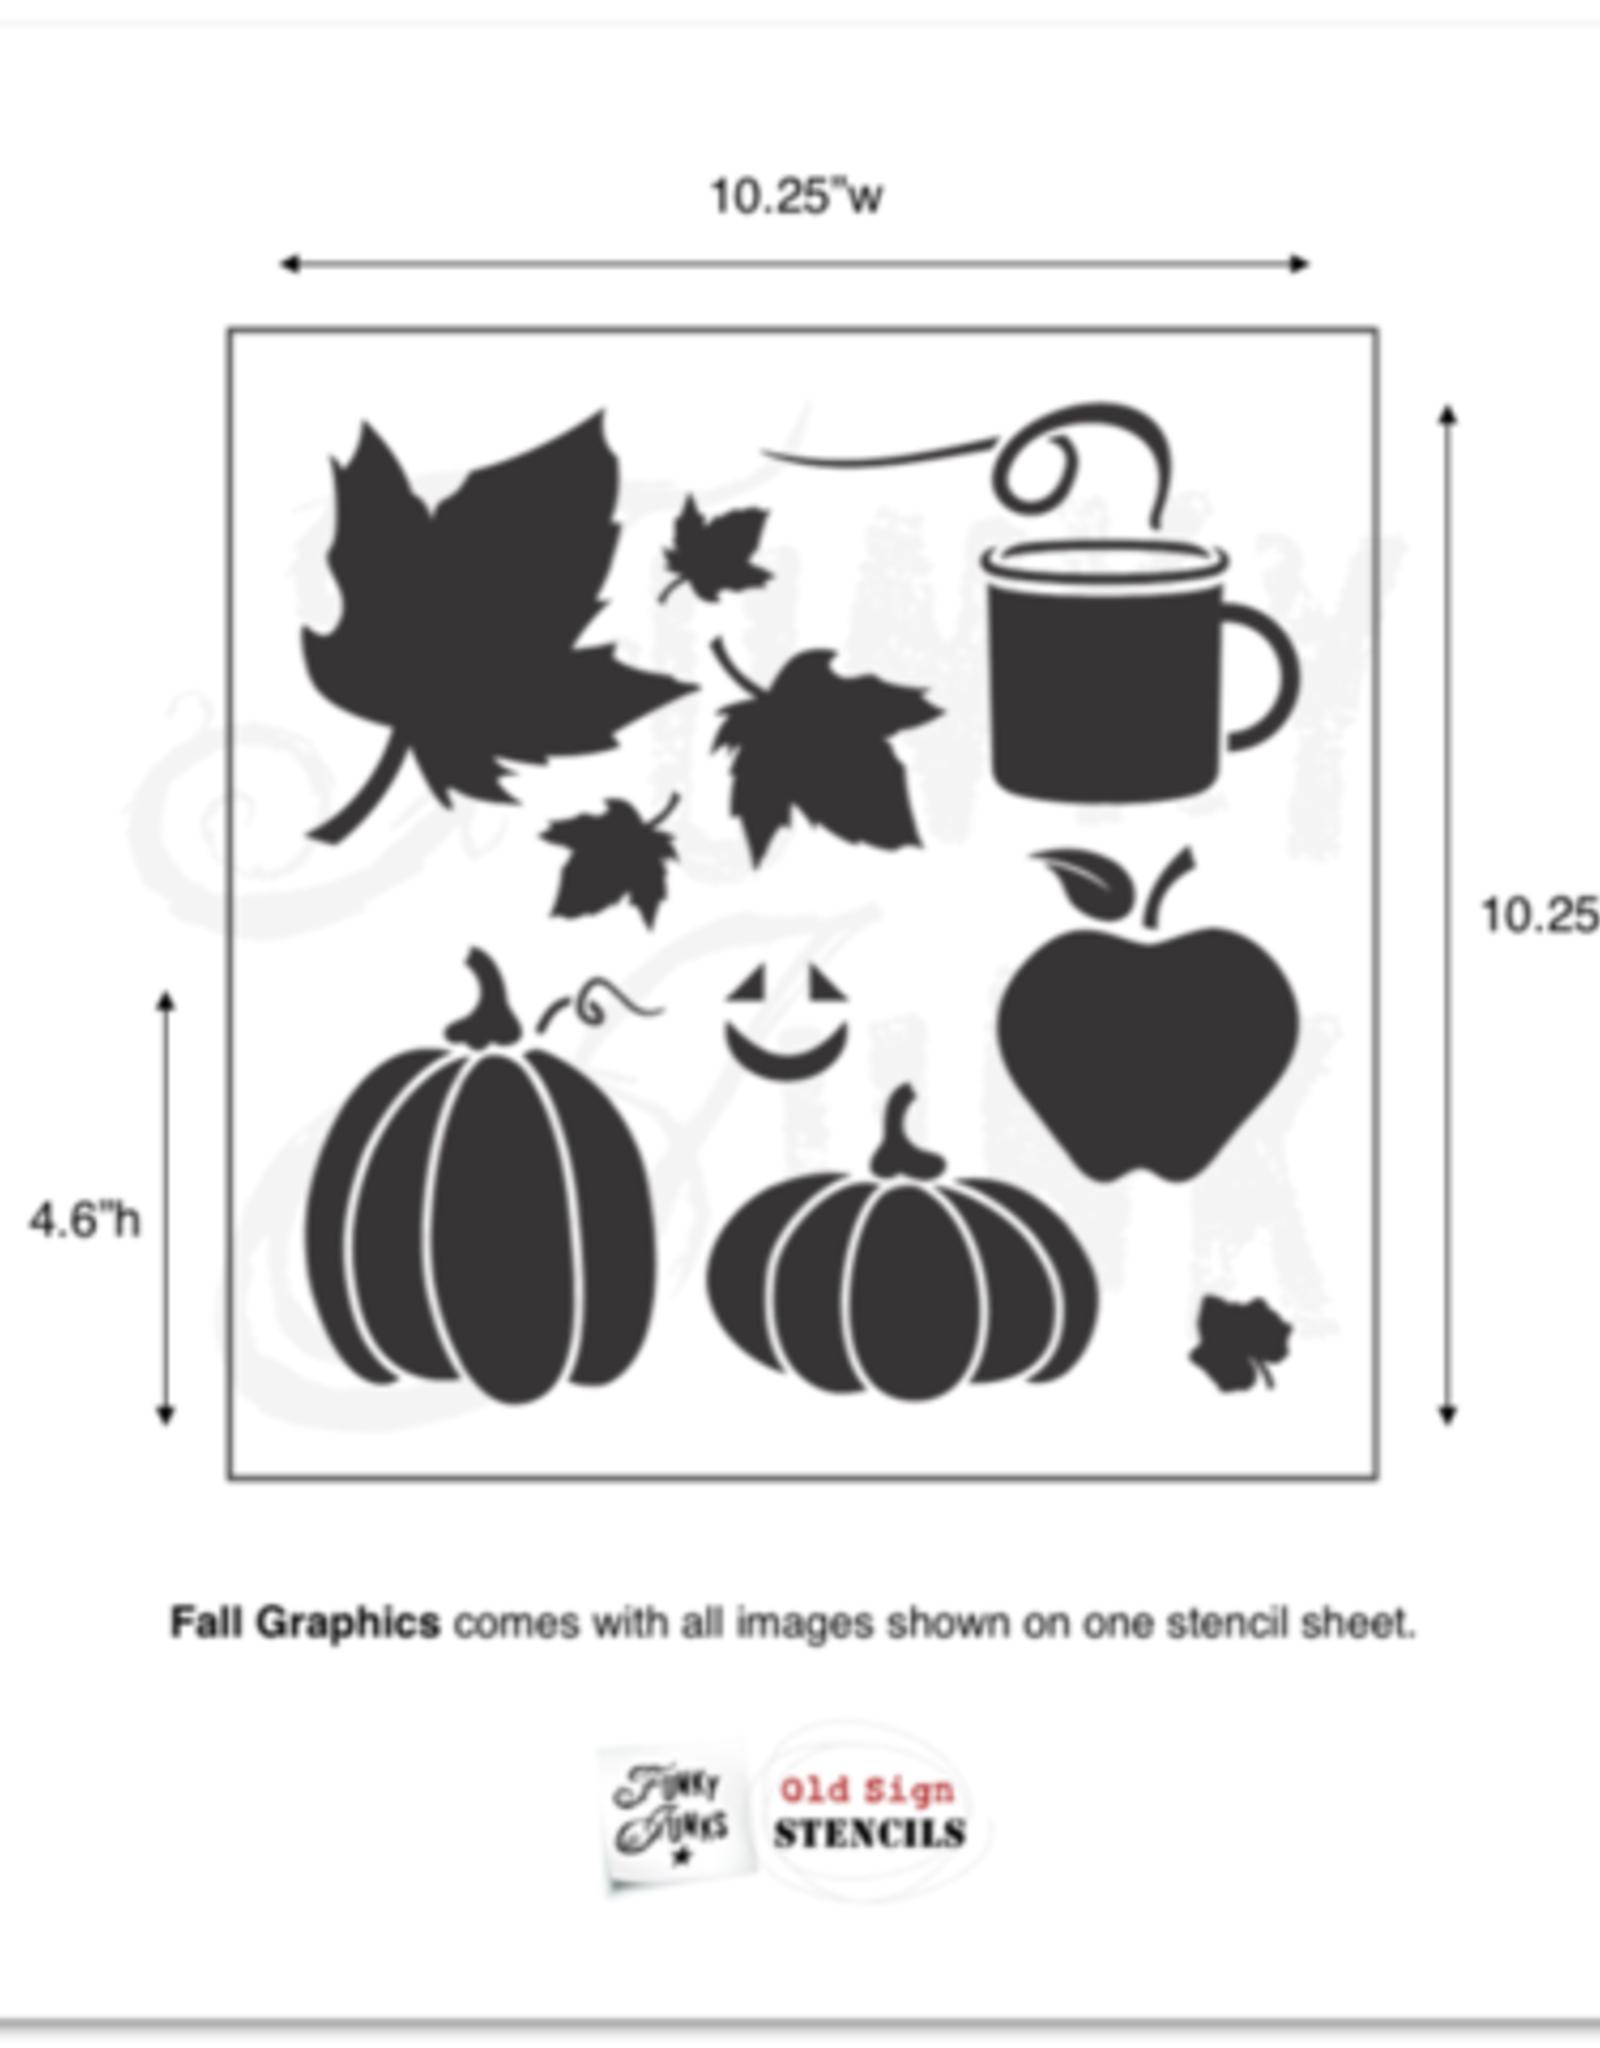 Funky Junk's Fall Graphics Stencil